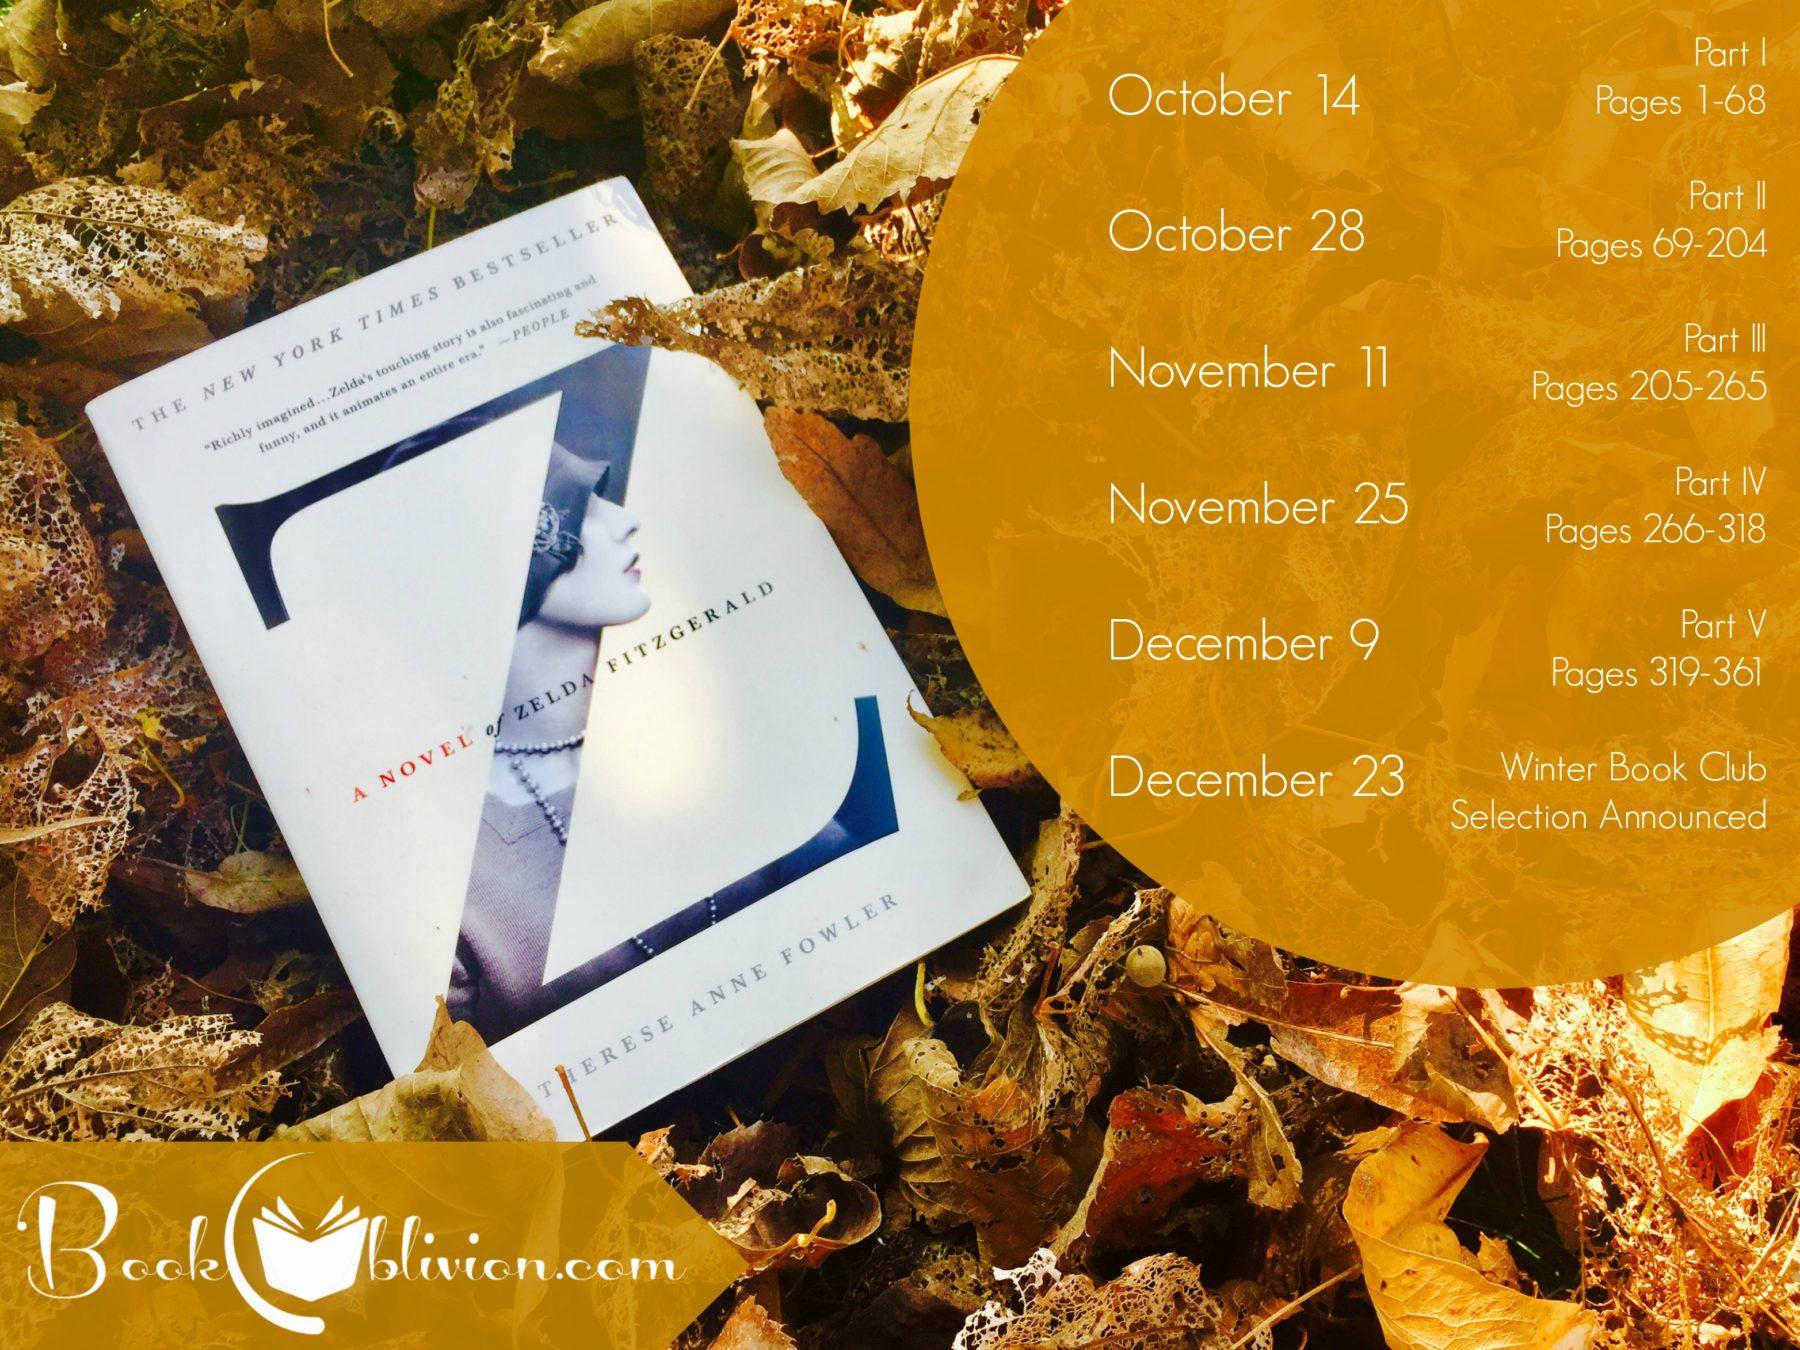 Fall Book Club Reading Schedule